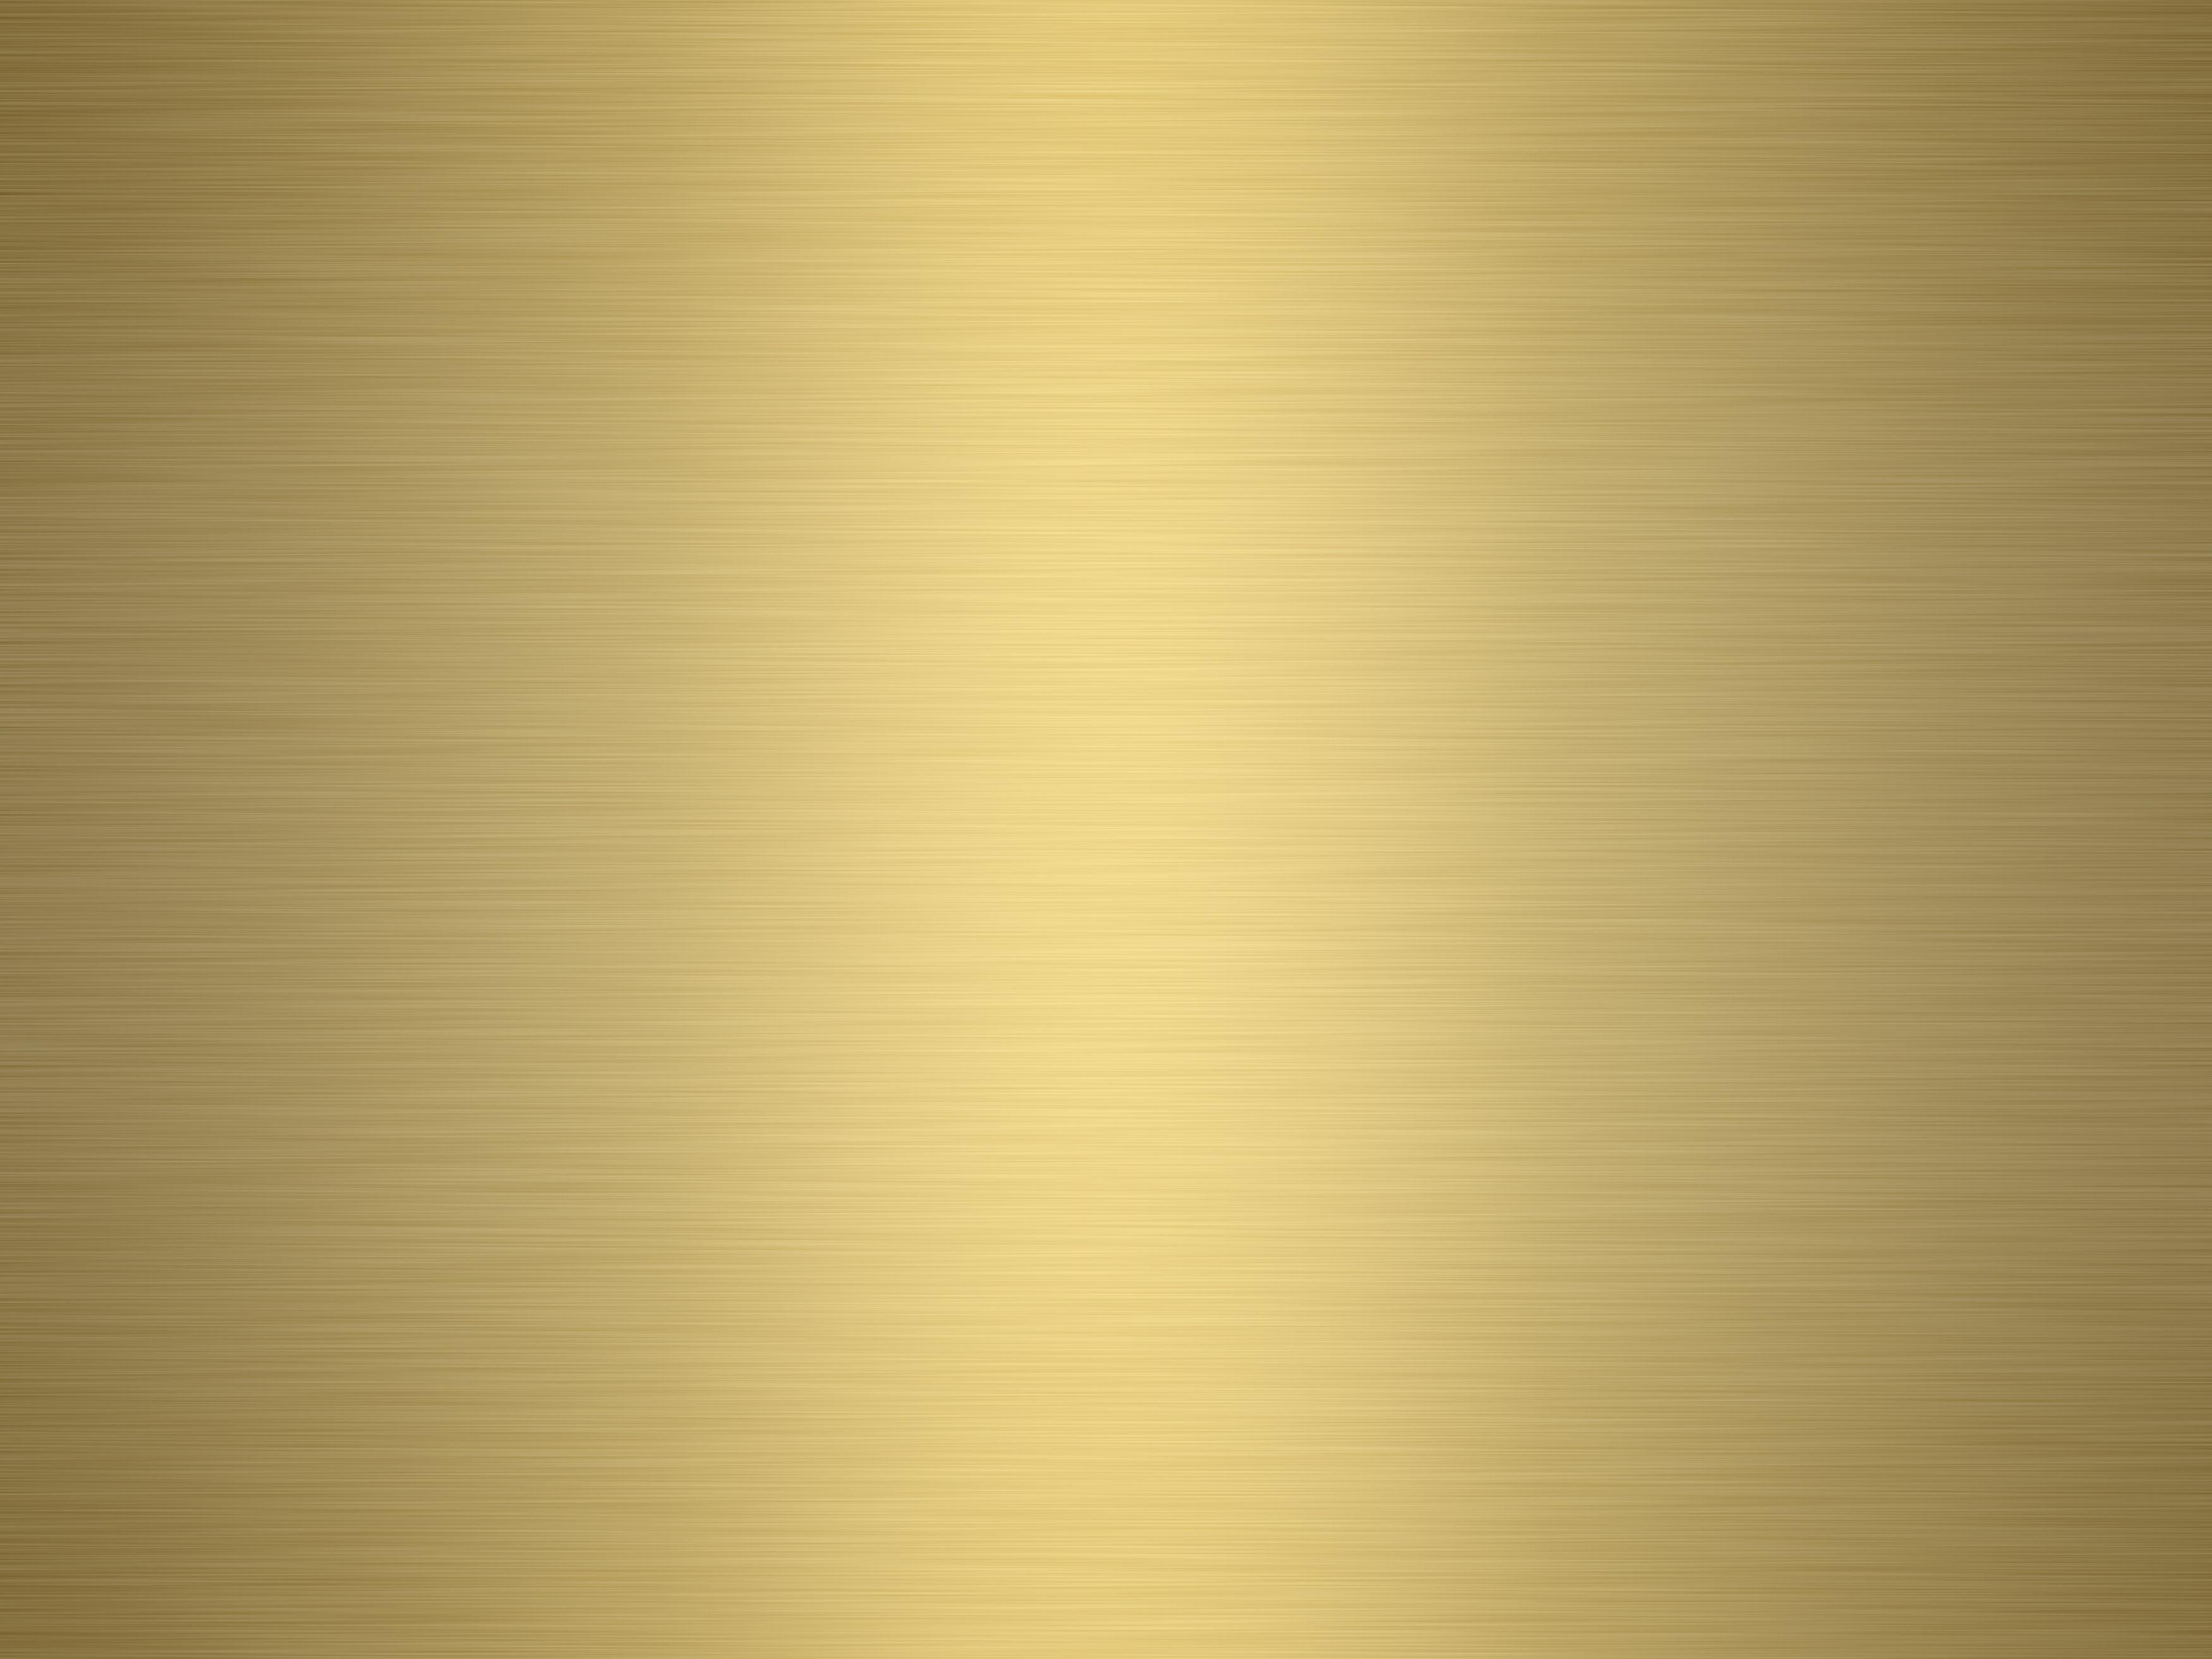 brushed gold metal background texture wwwmyfreetexturescom 1500 3500x2625